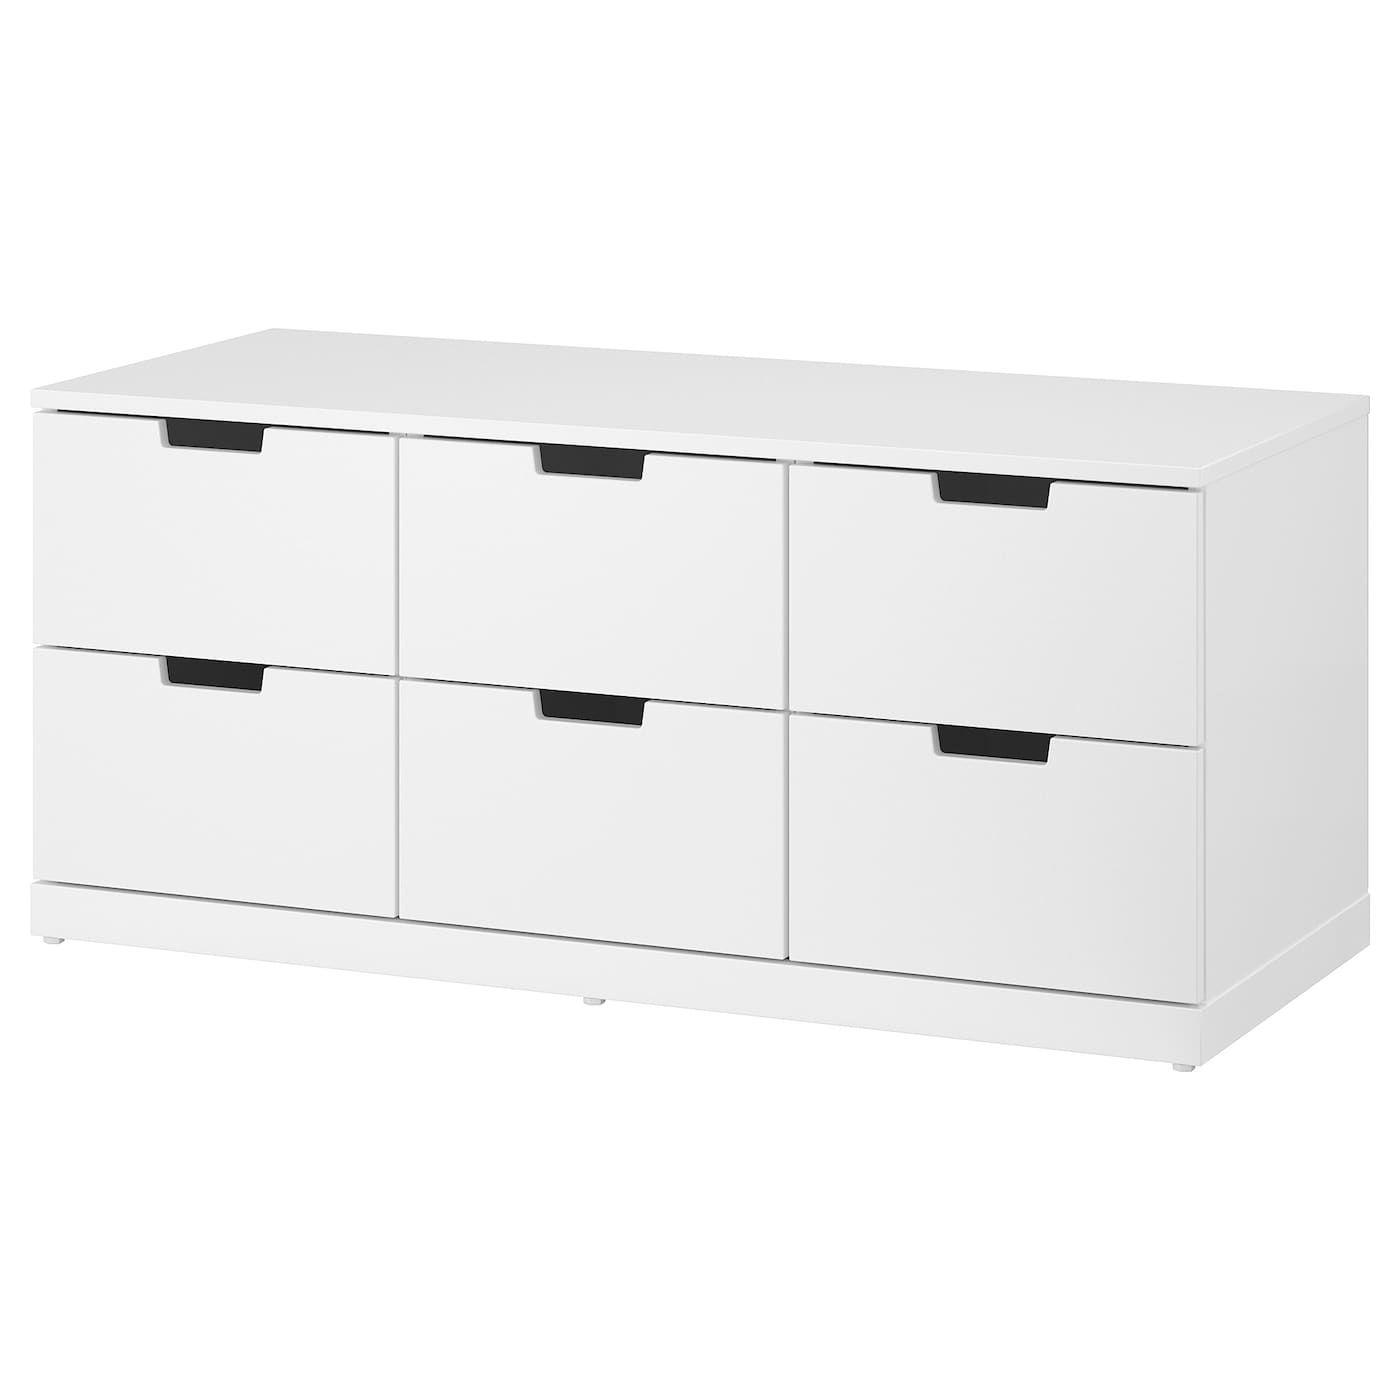 Nordli Commode 6 Tiroirs Blanc Commode 6 Tiroirs Tiroir Et Commode Ikea